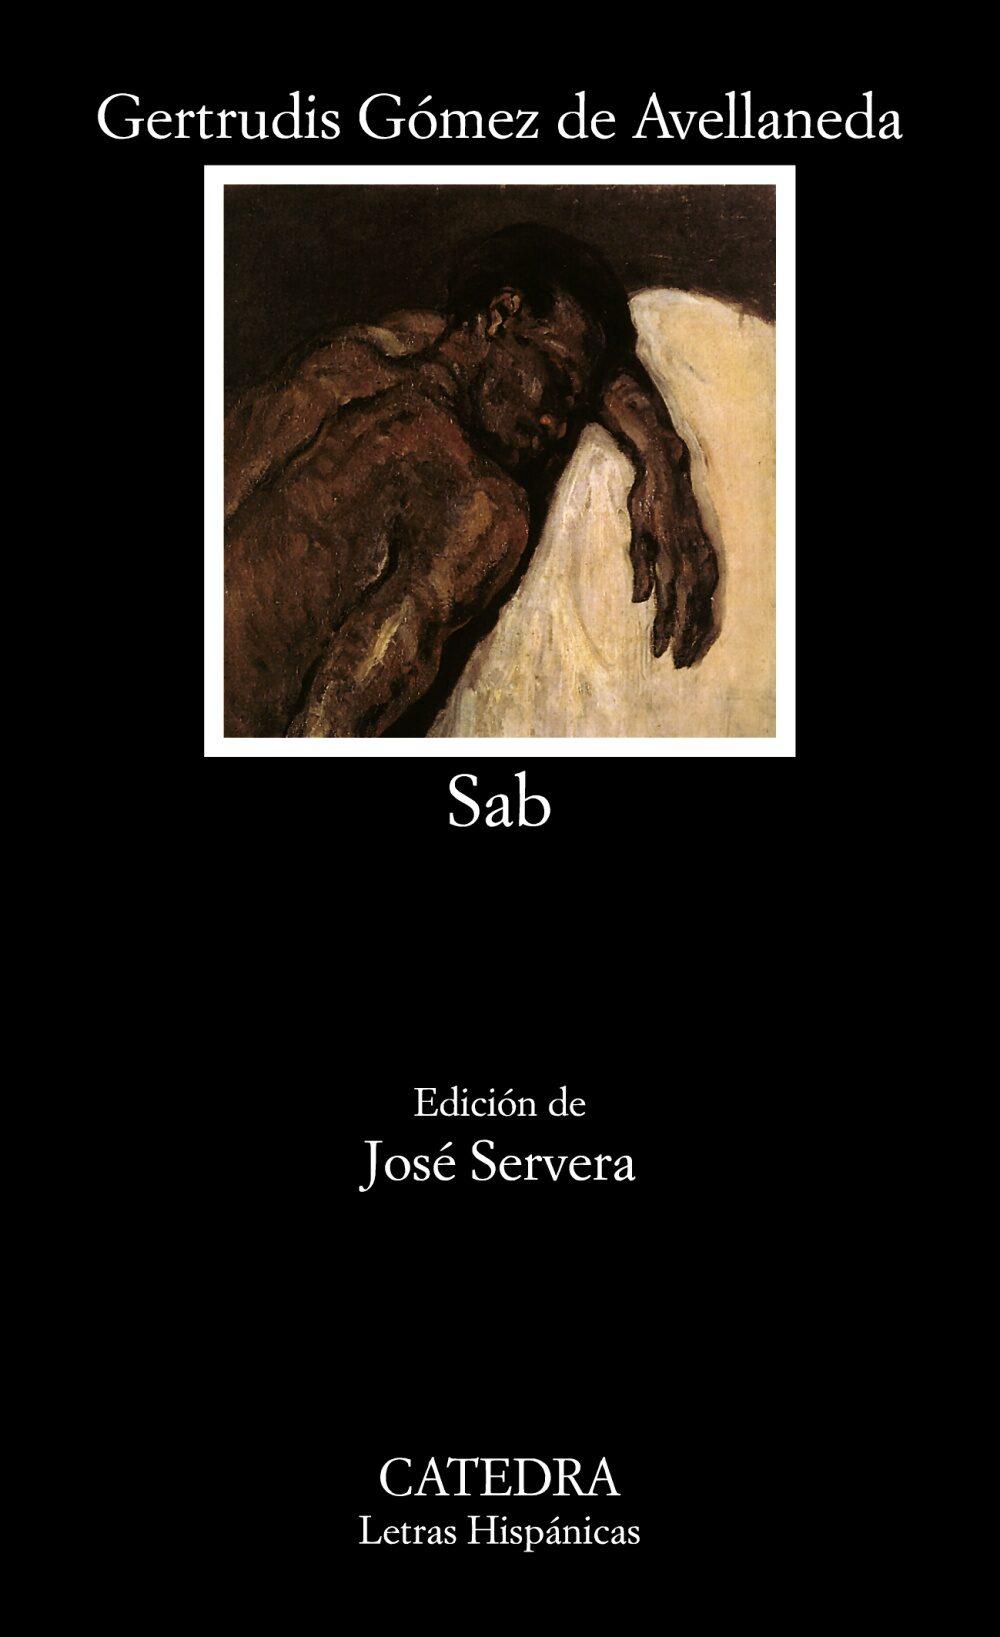 sab-gertrudis gomez de avellaneda-9788437615943